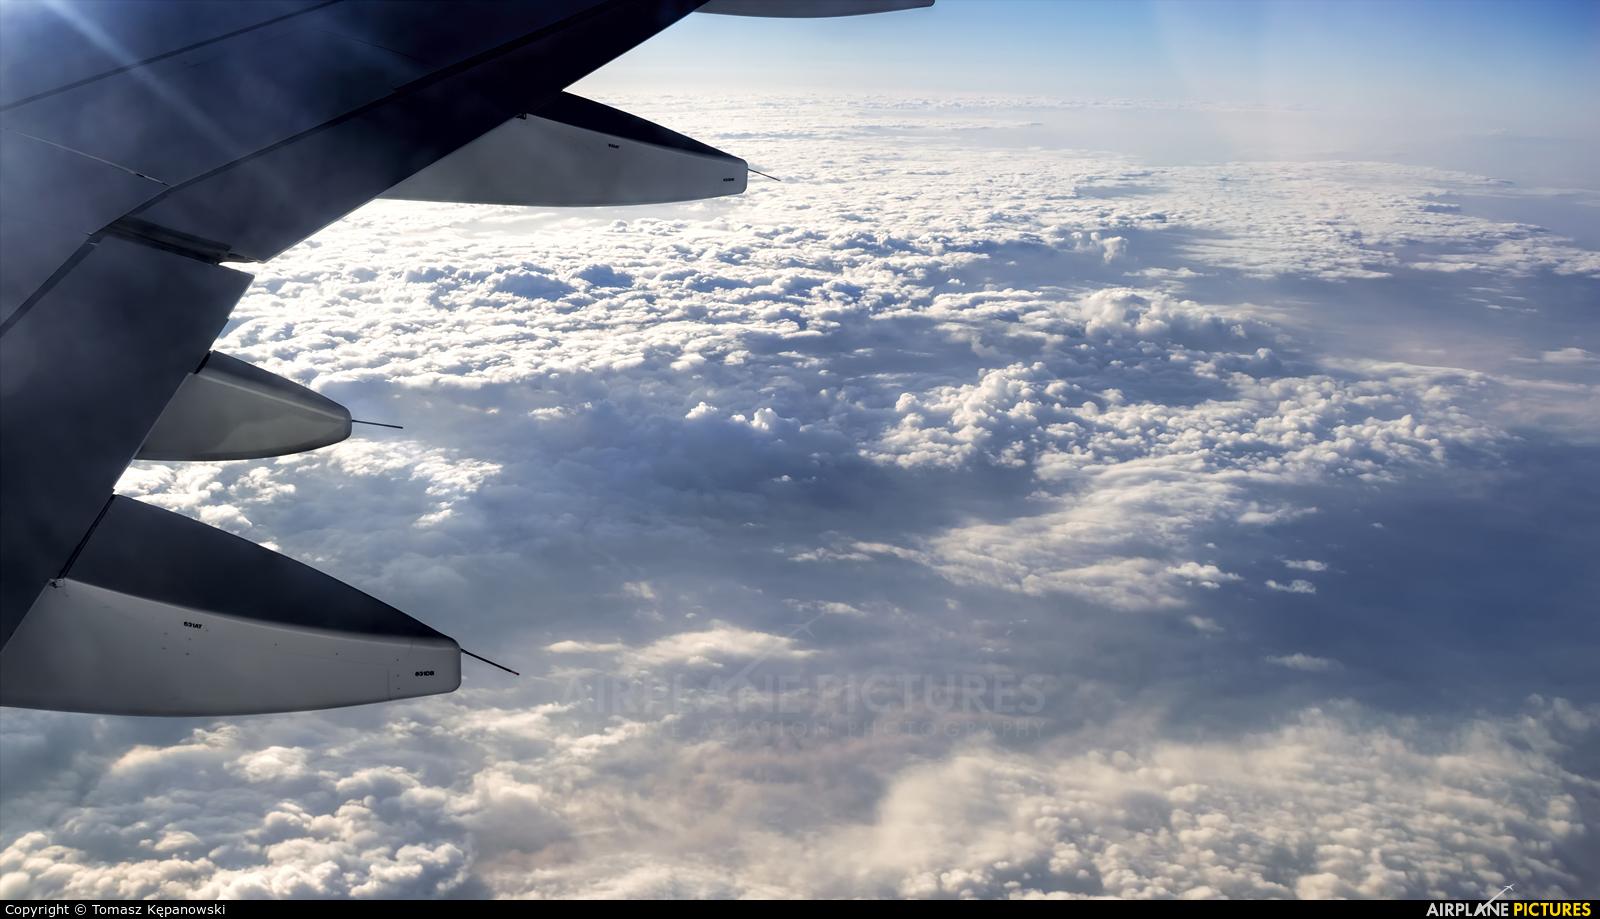 LaudaMotion OE-LMB aircraft at In Flight - International